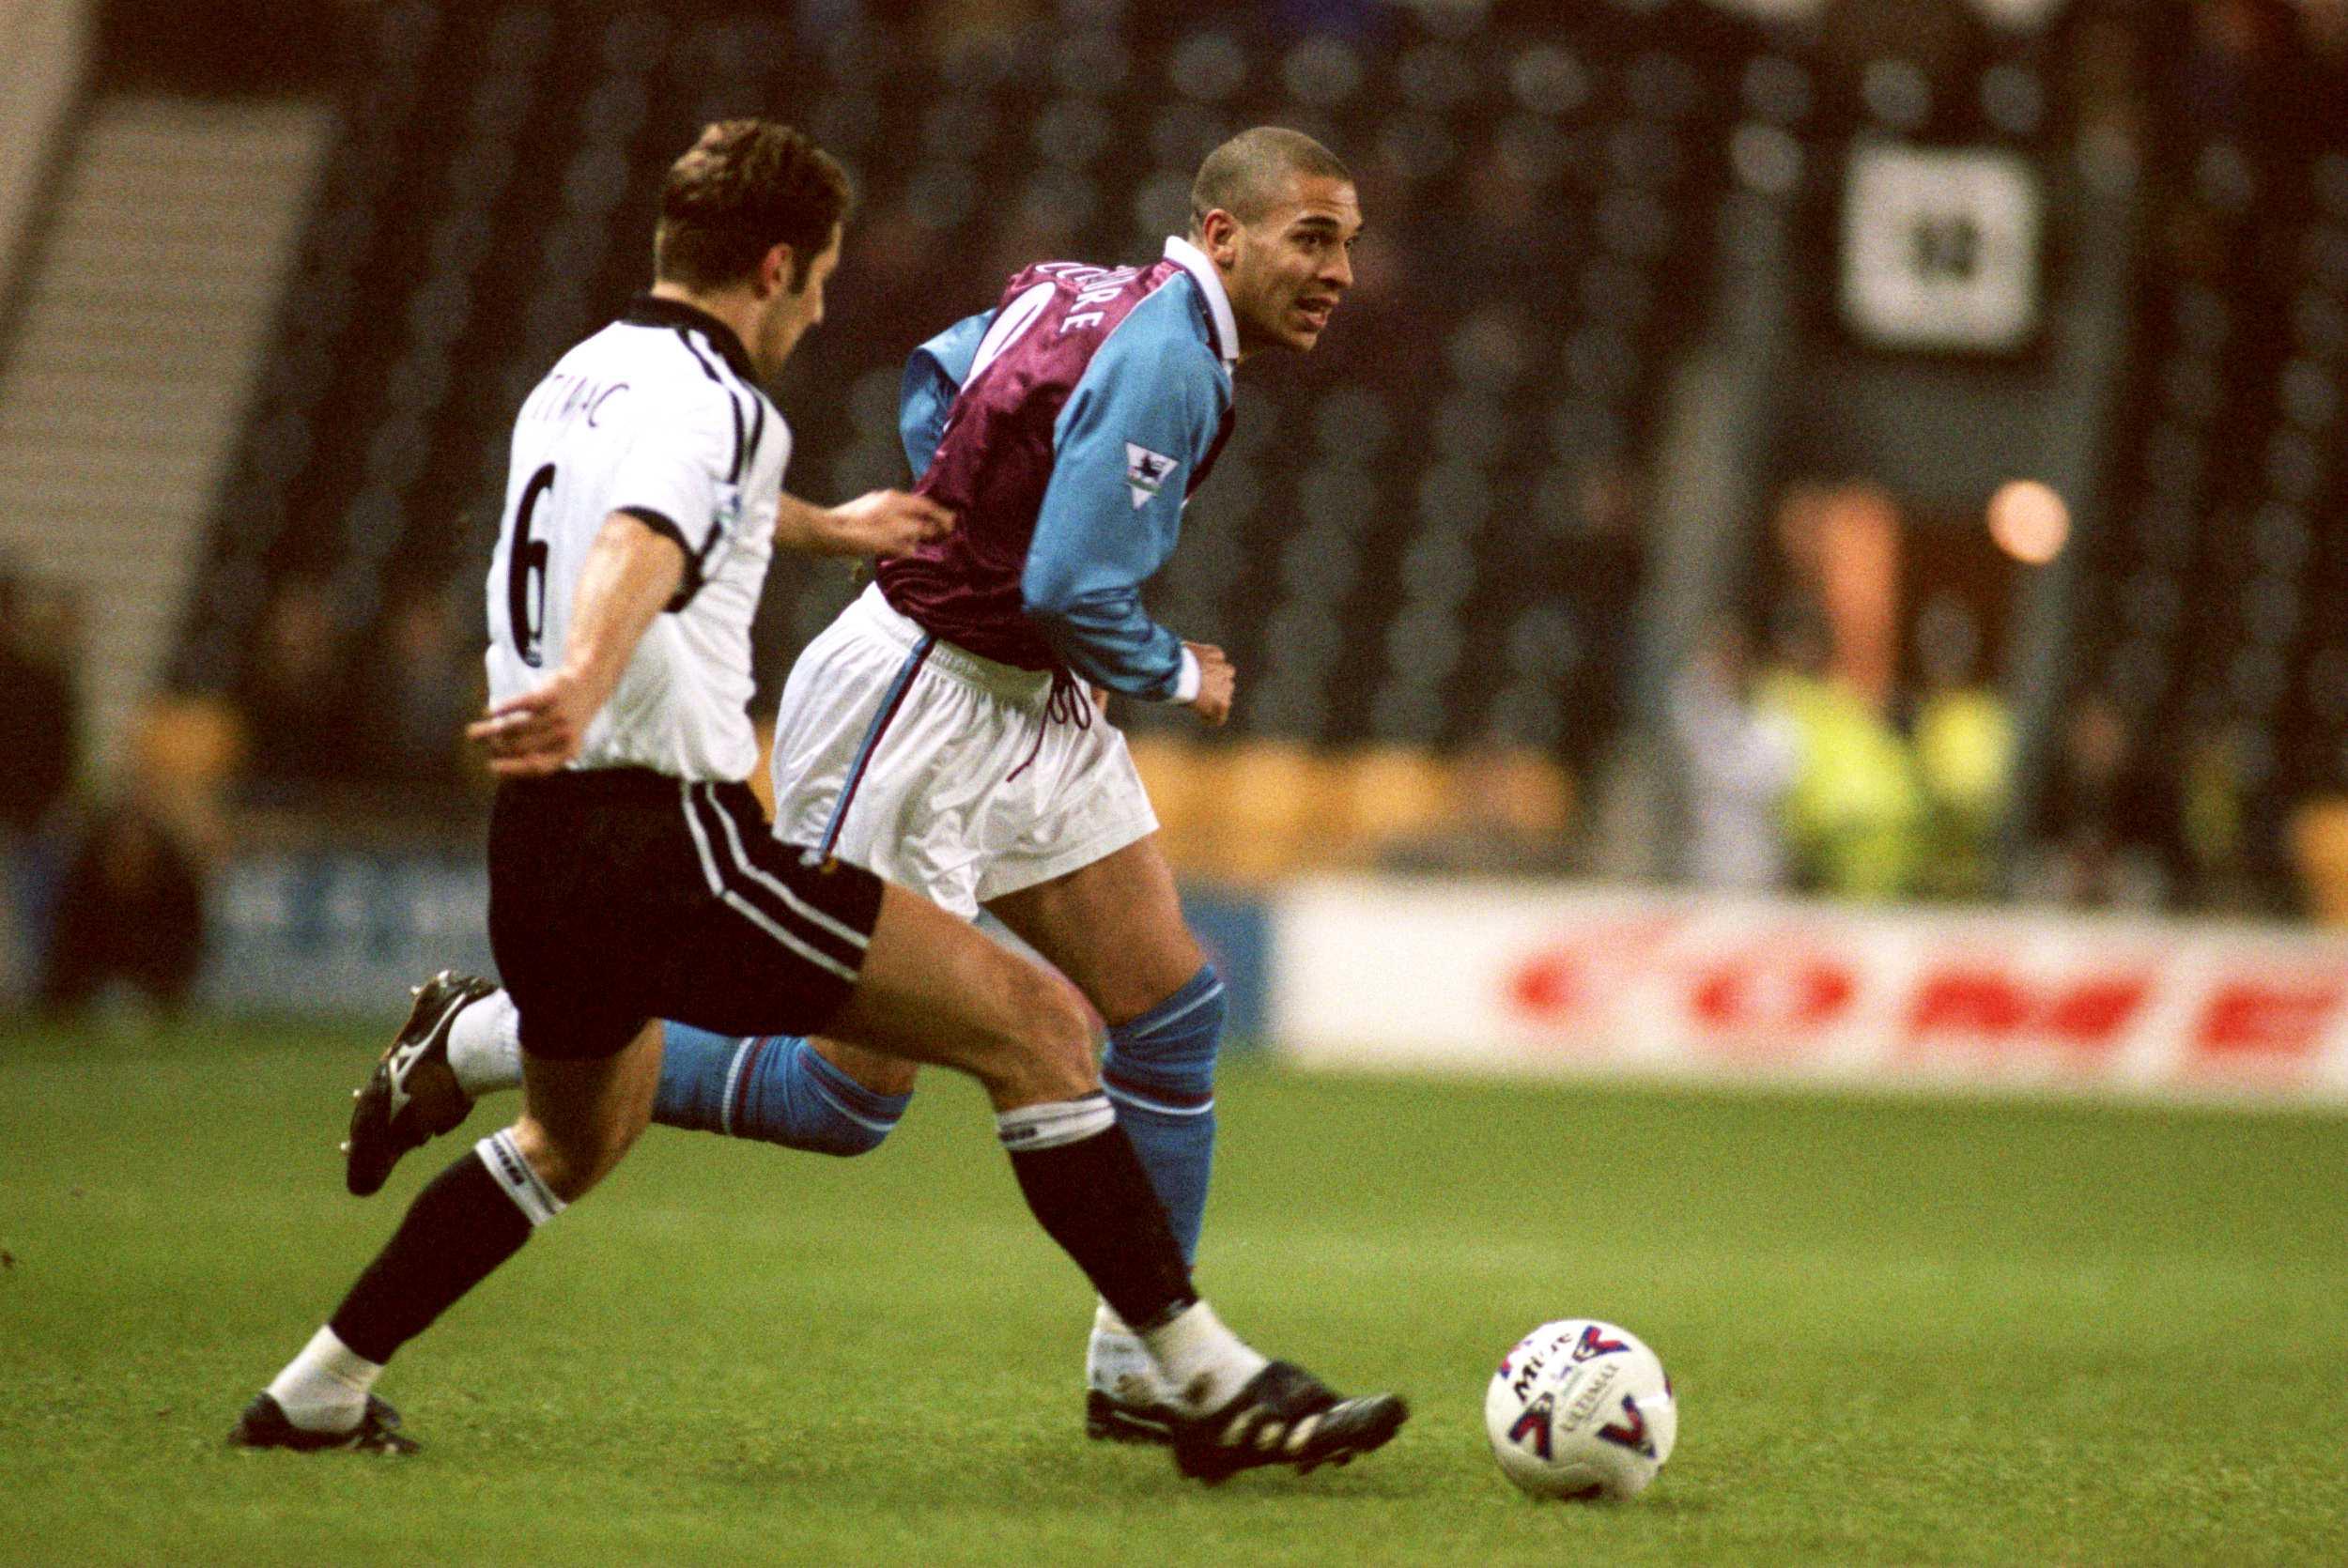 Soccer - FA Carling Premiership - Derby County v Aston Villa